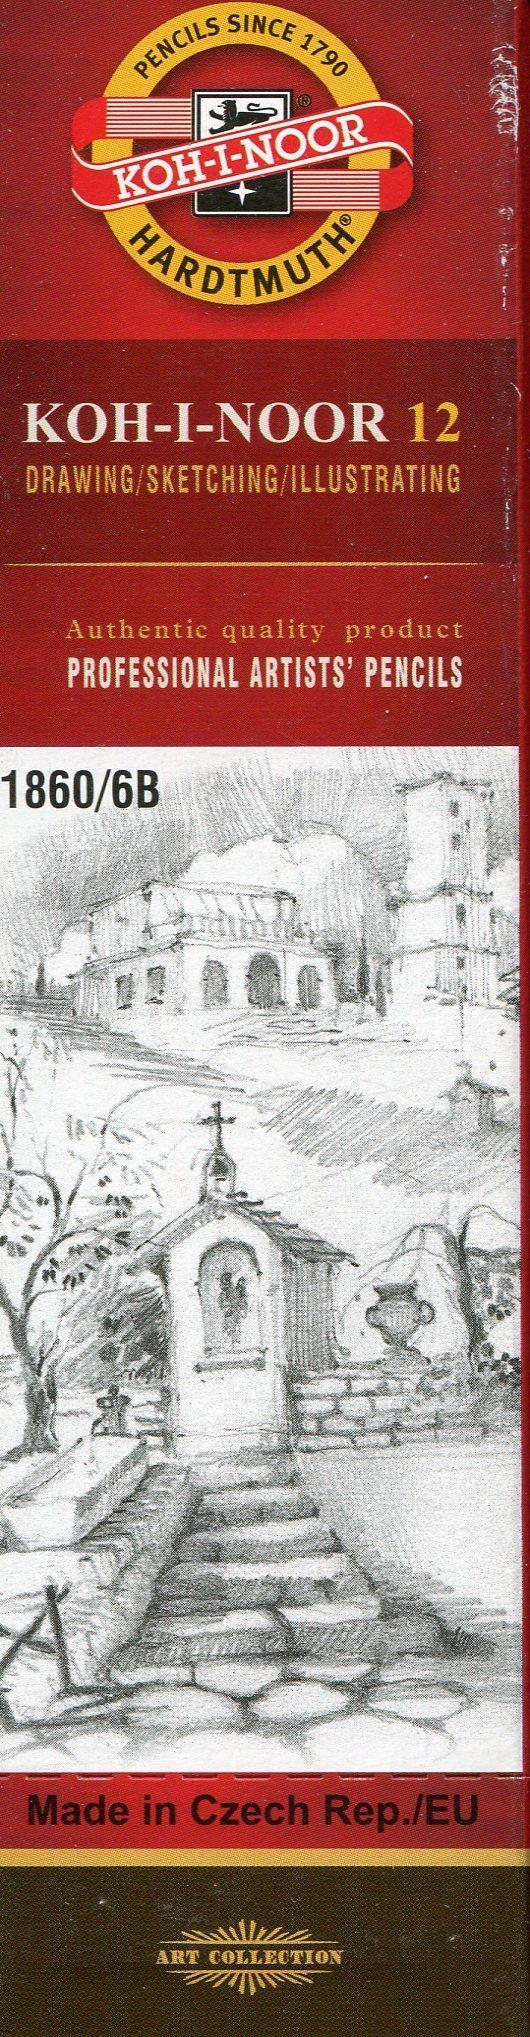 Koh-I-Noor Koh-I-Noor Ołówek grafitowy 1860/6B 12 szt